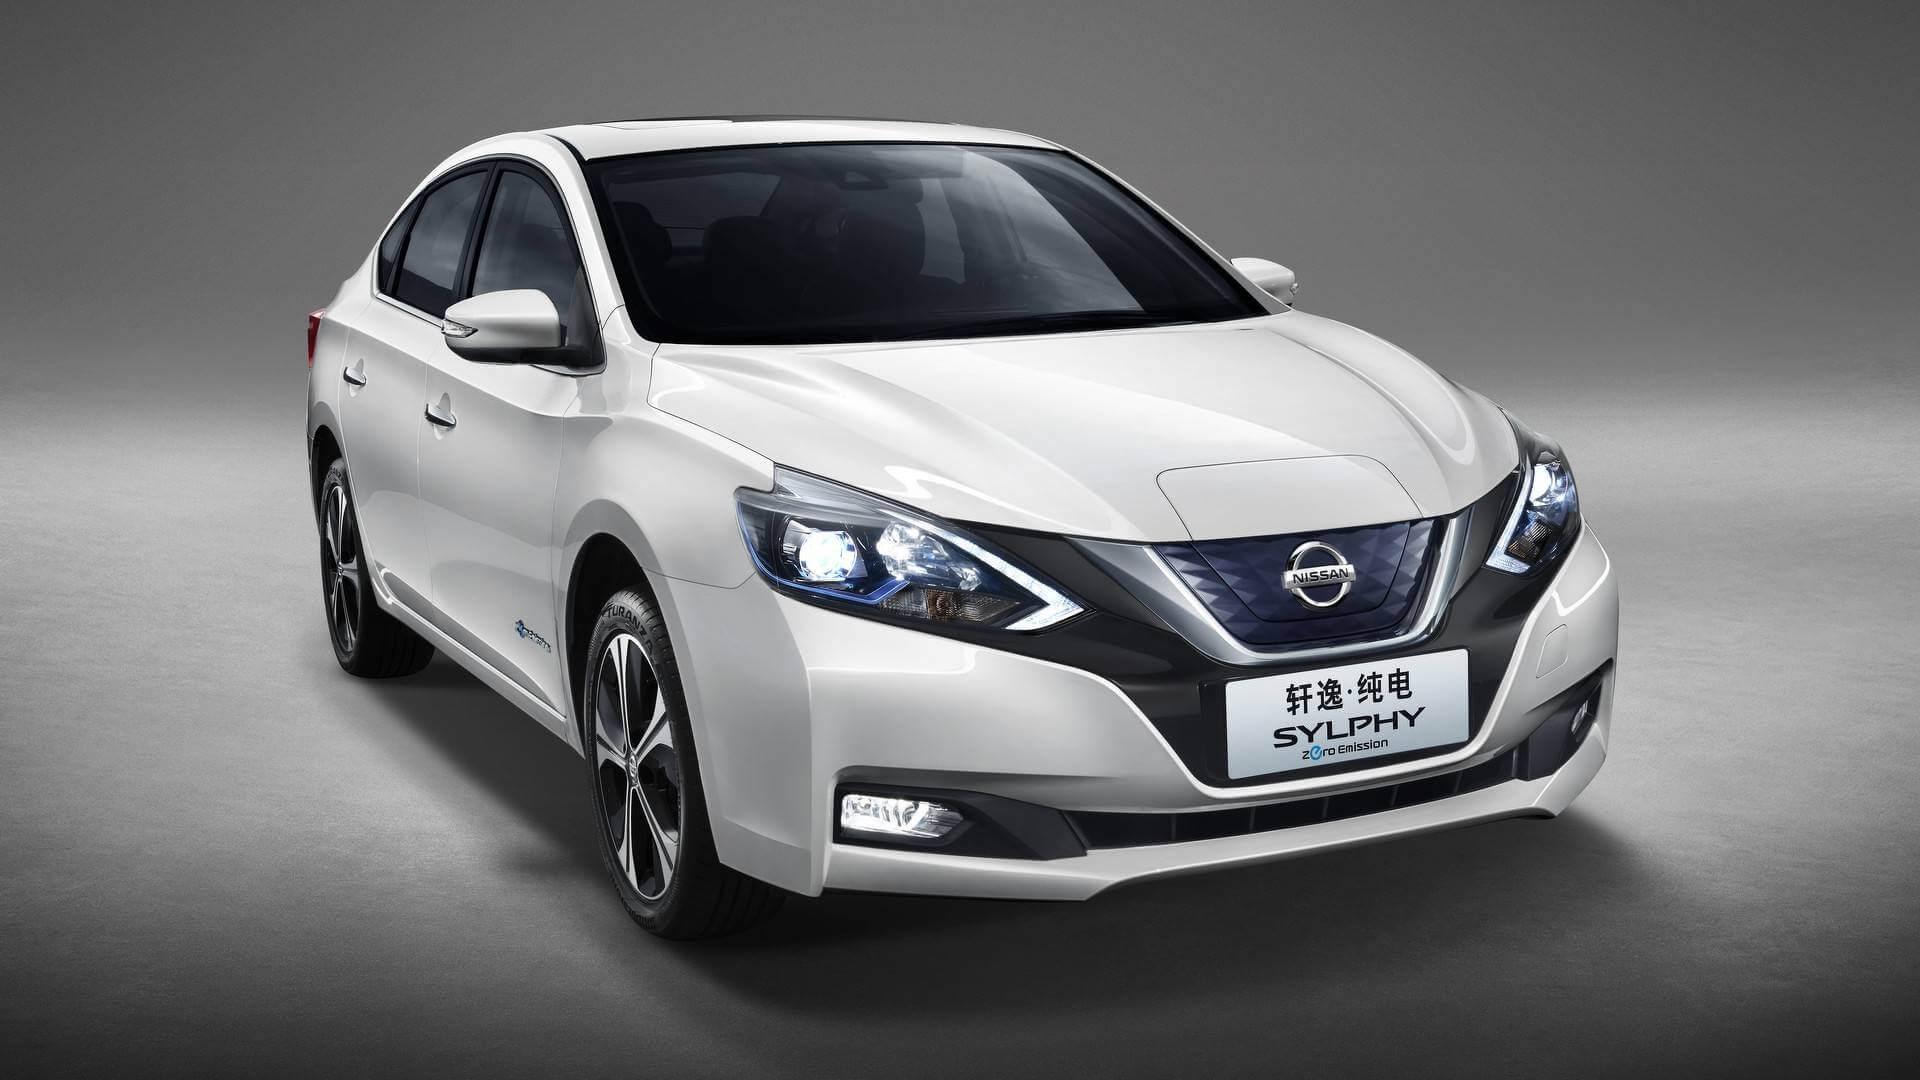 Nissan Sylphy Zero Emission базе Leaf для китайского рынка